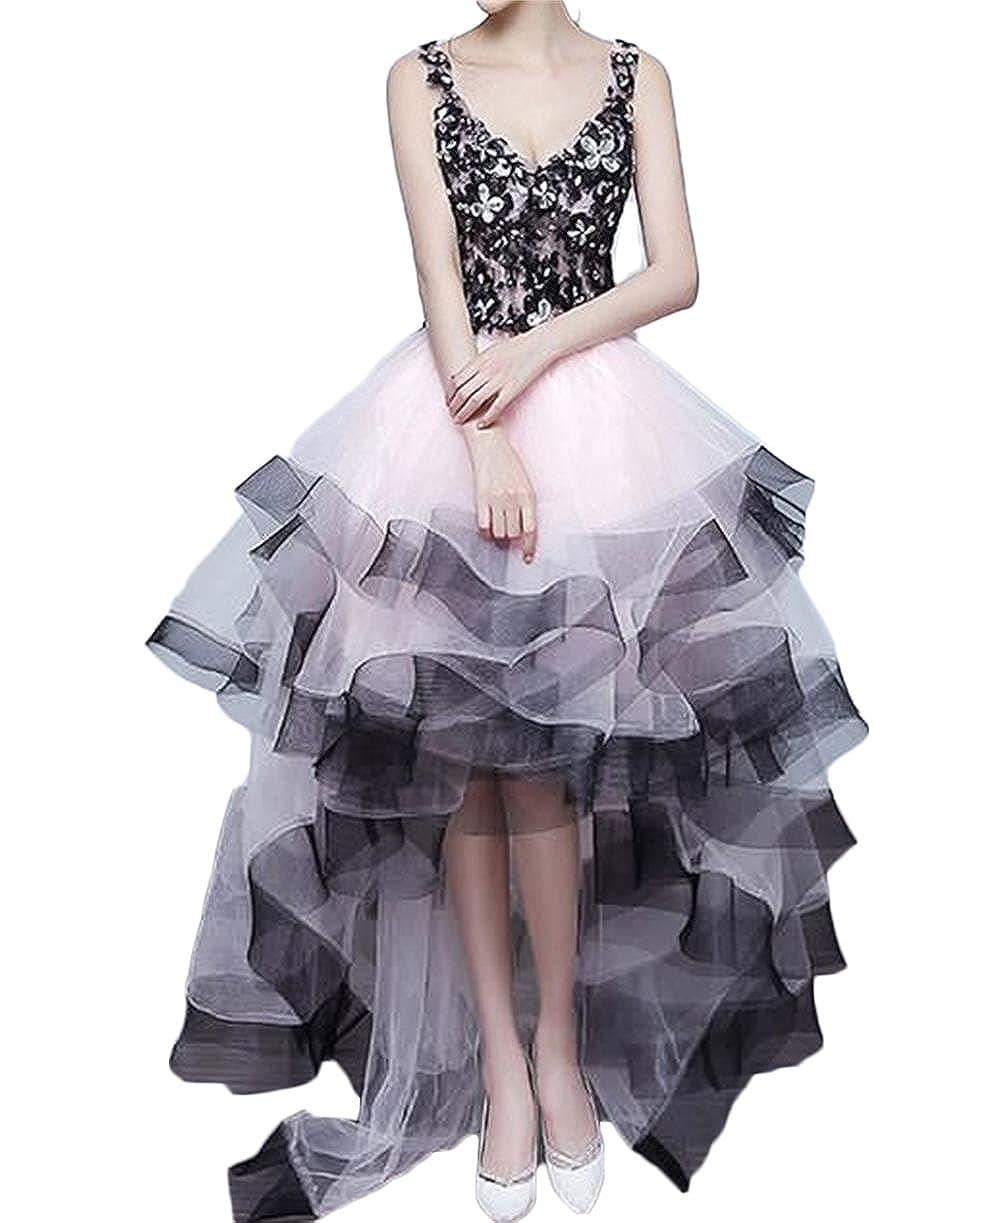 BaiYiYan Womens V Neck Lace Short Prom Dress Party Homecoming Dresses Hi-Lo B14 - Pink - 8: Amazon.co.uk: Clothing